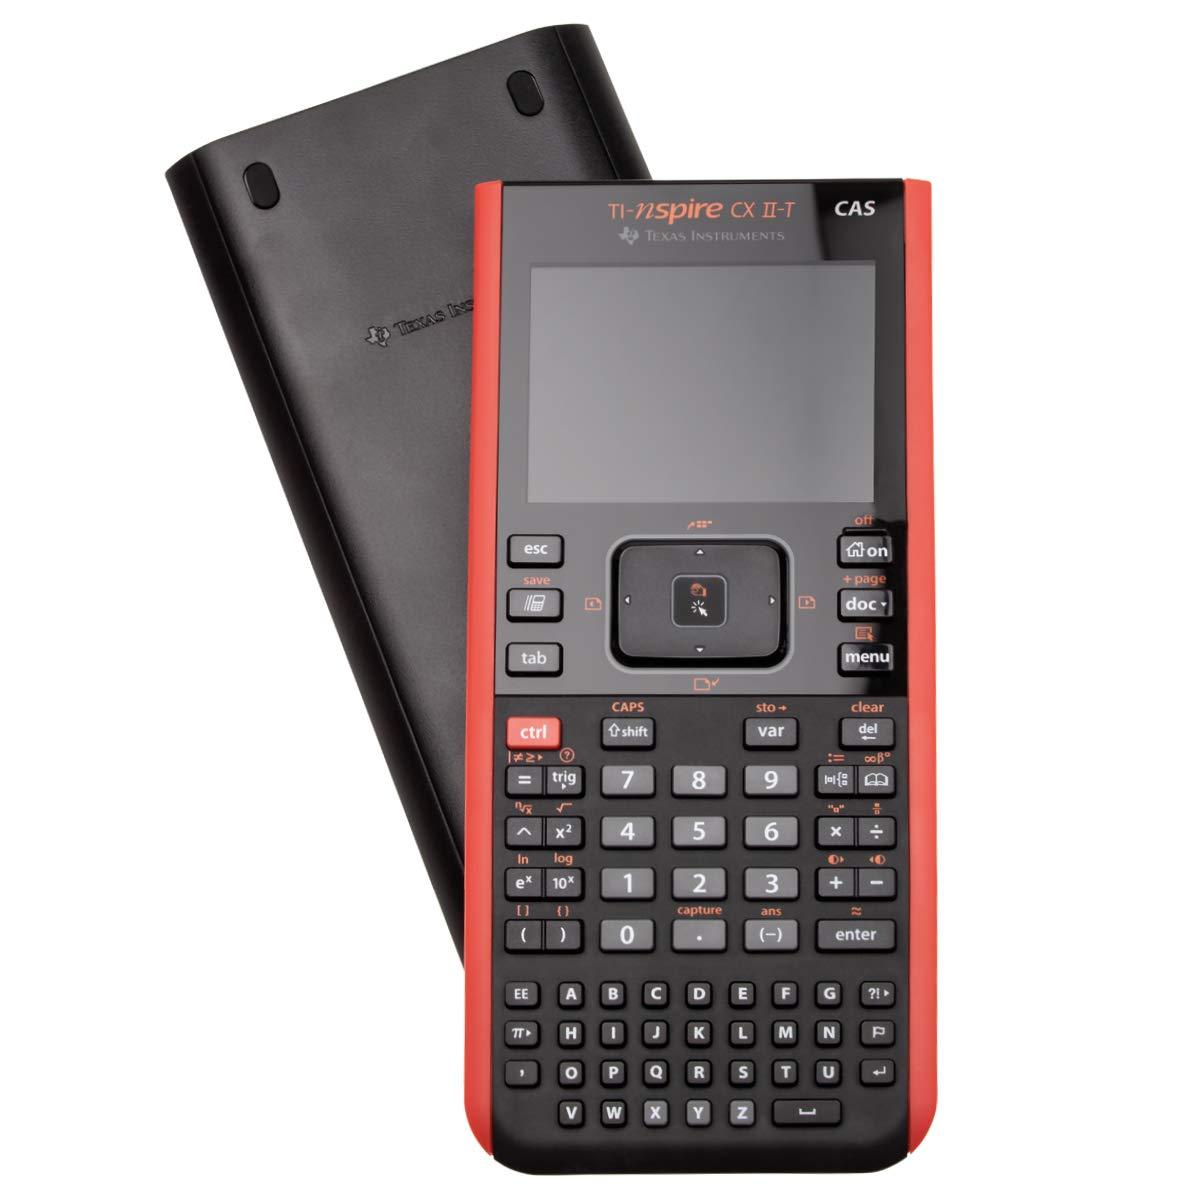 Farbdisplay TI-Nspire CX II-T CAS Grafikrechner